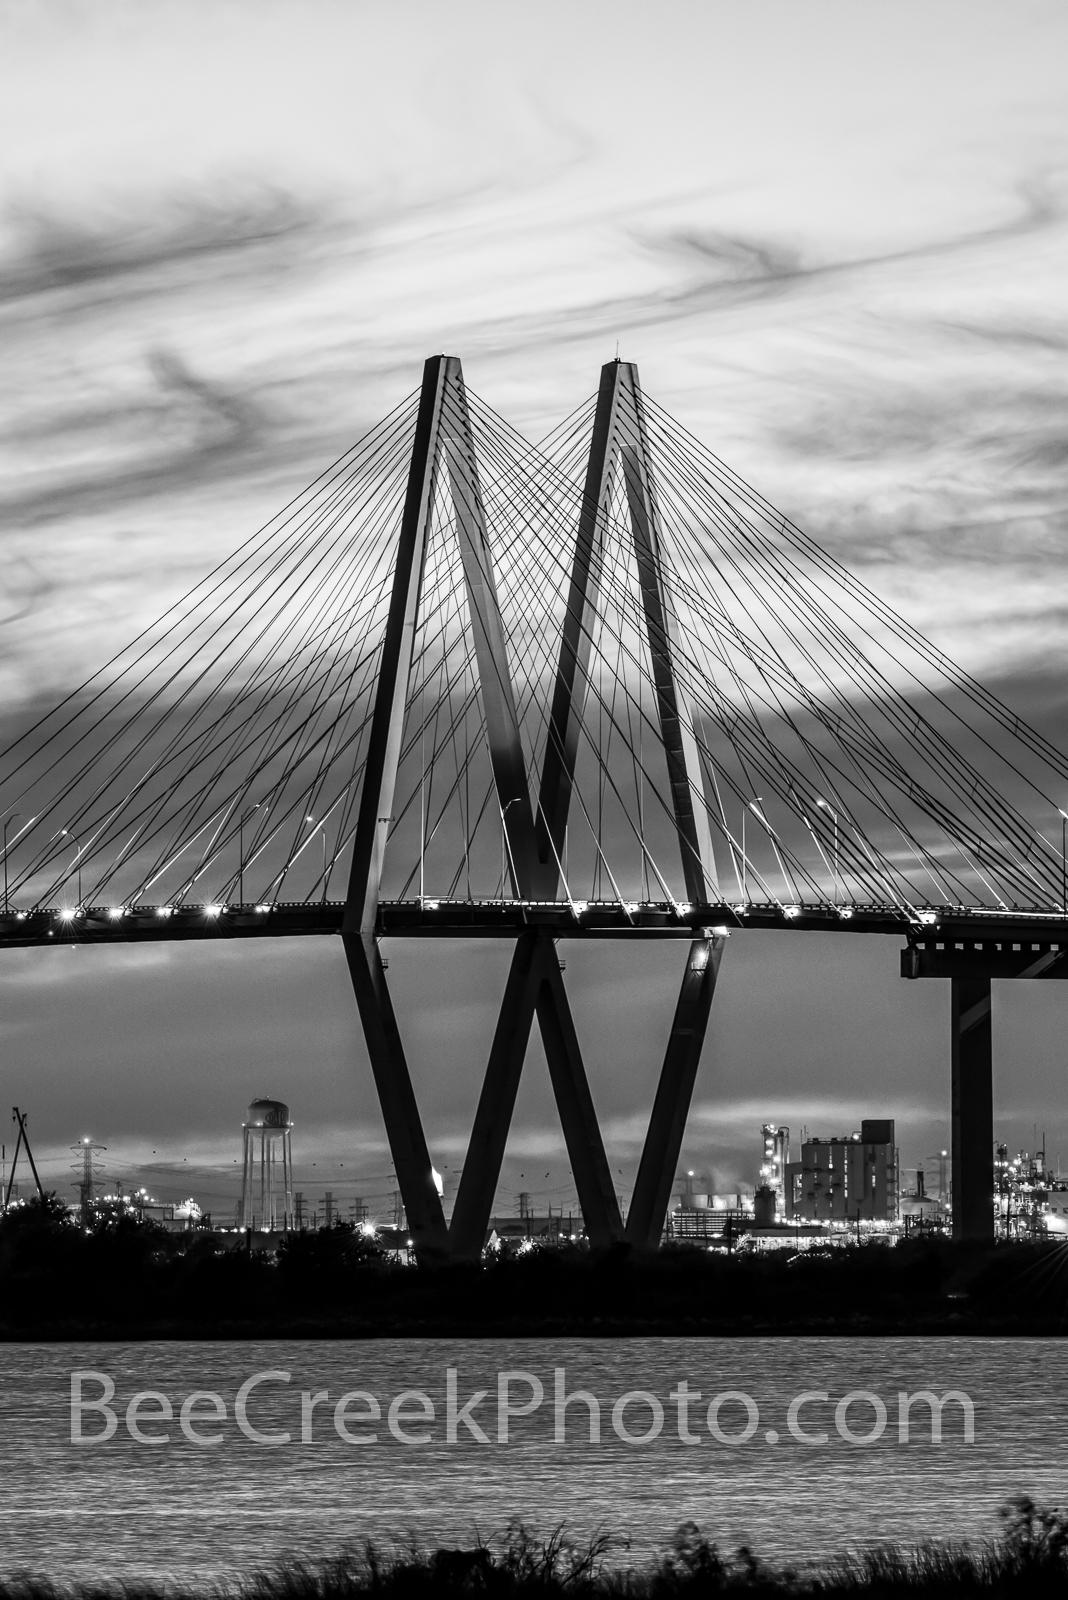 Fred Hartman Bridge  B W, vertical, architecture, bridge, black and white, La Porte, Baytown, cable stay bridge, Texas, Port of Houston,  refineriers, industrial,  ship channel, texas coast, , photo